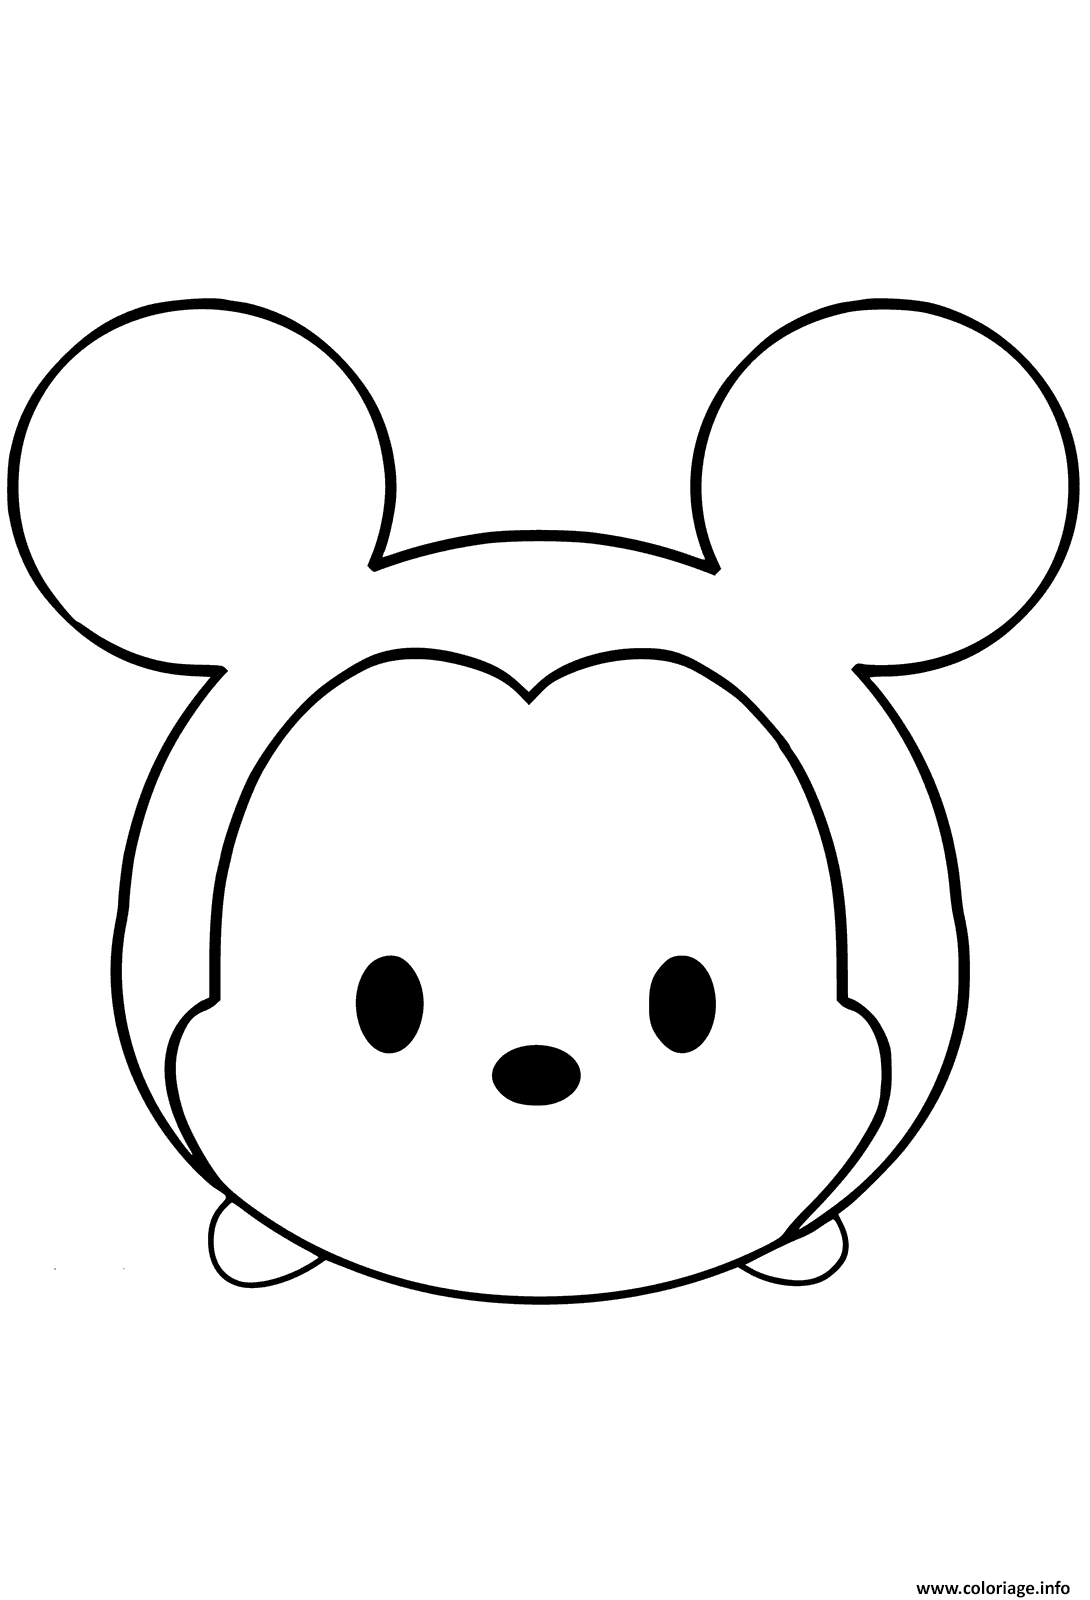 Kleurplaten Emoji Unicorn.Kleurplaat Emoji Auto Electrical Wiring Diagram